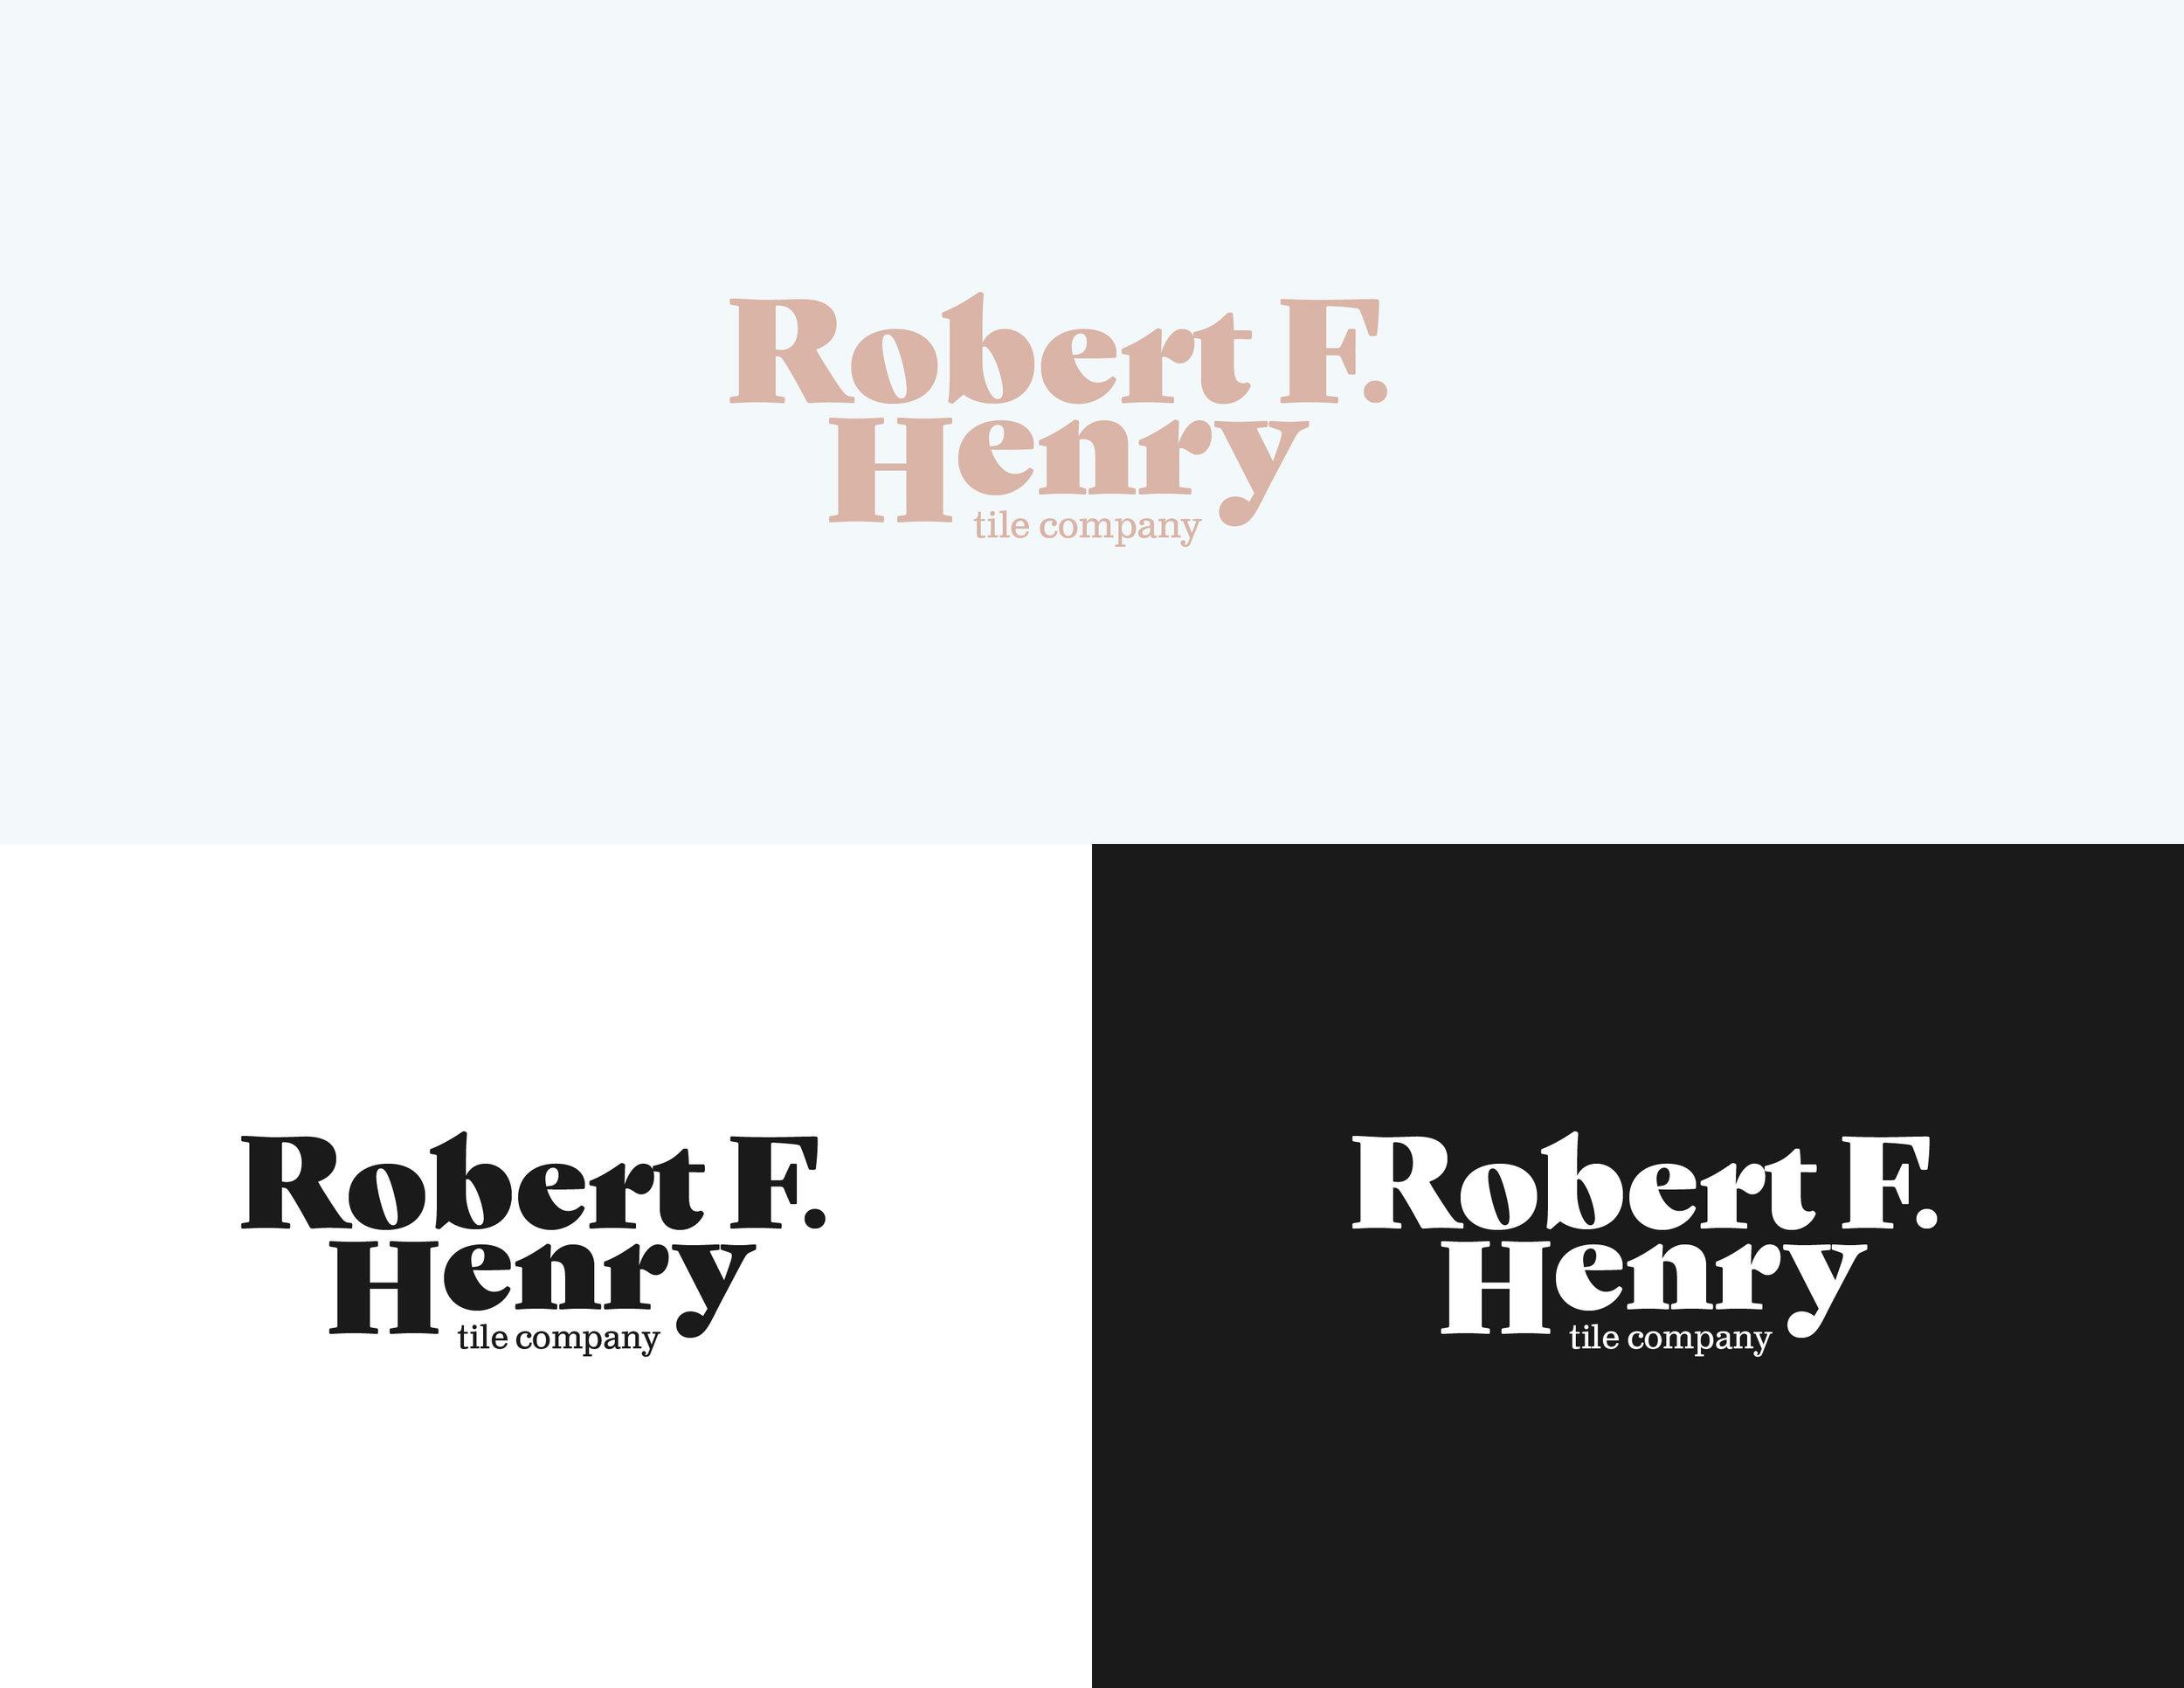 henry tile concepts illumi creative